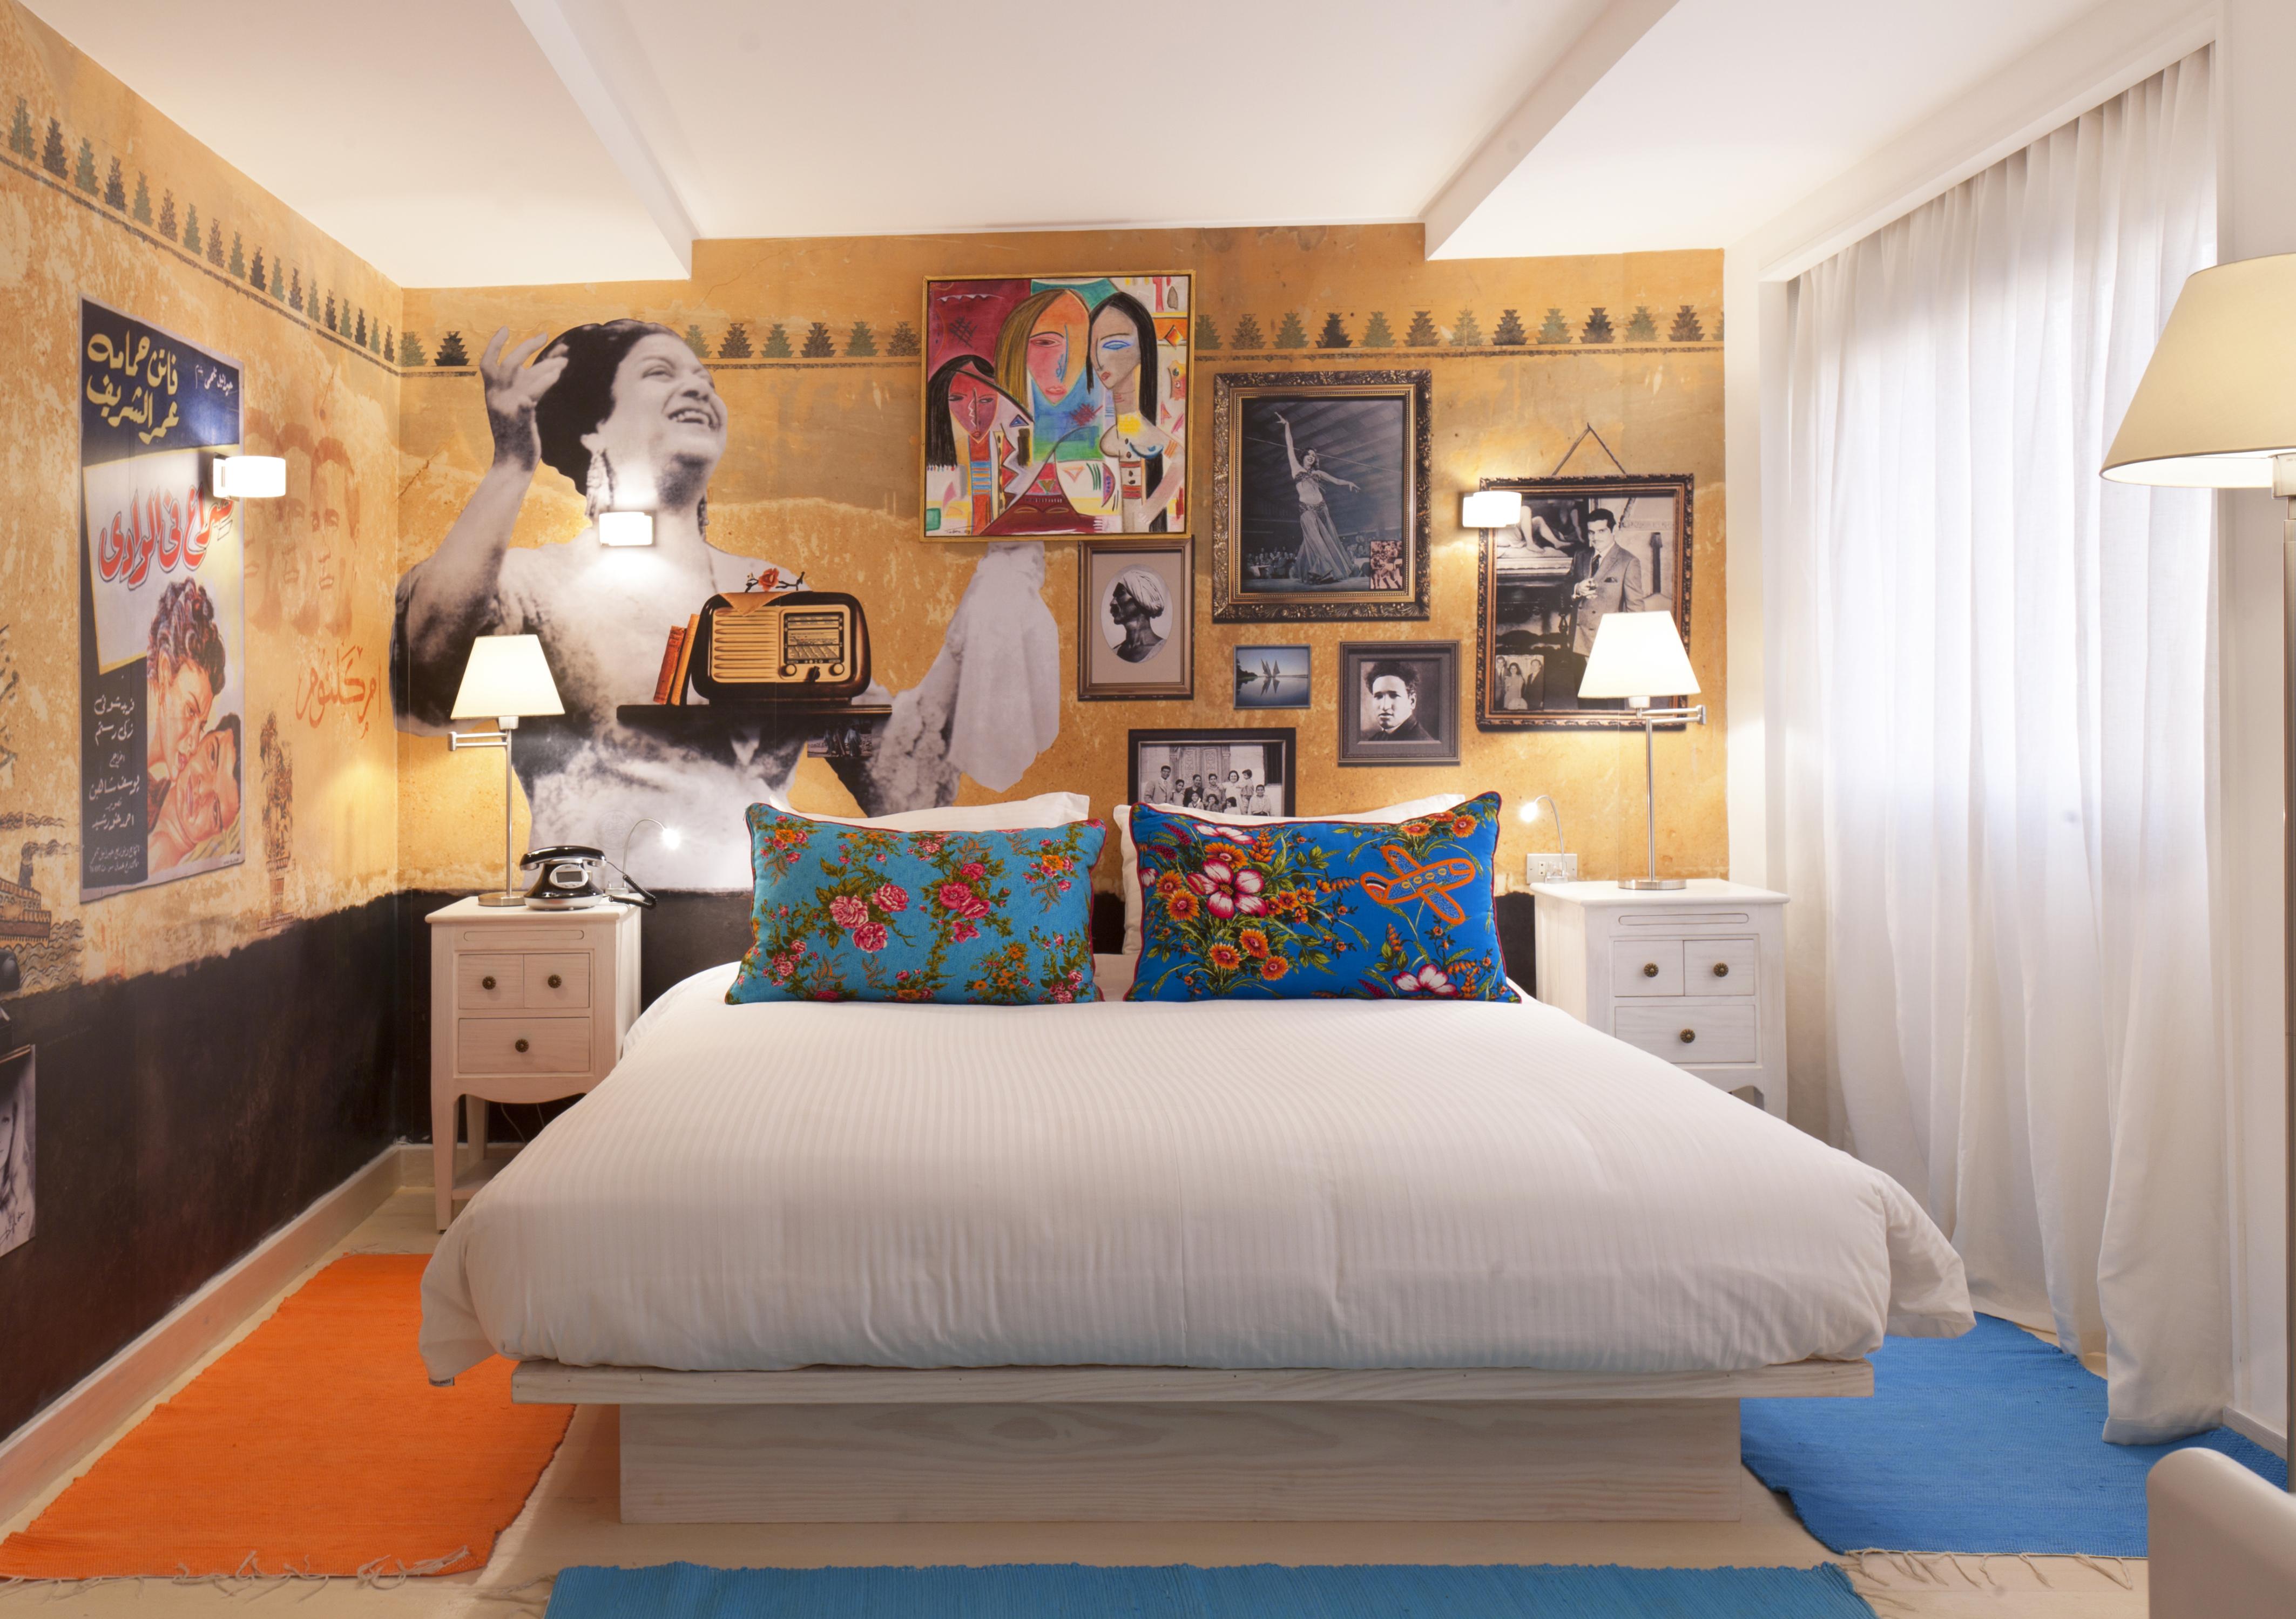 nile-cruise-bedroom